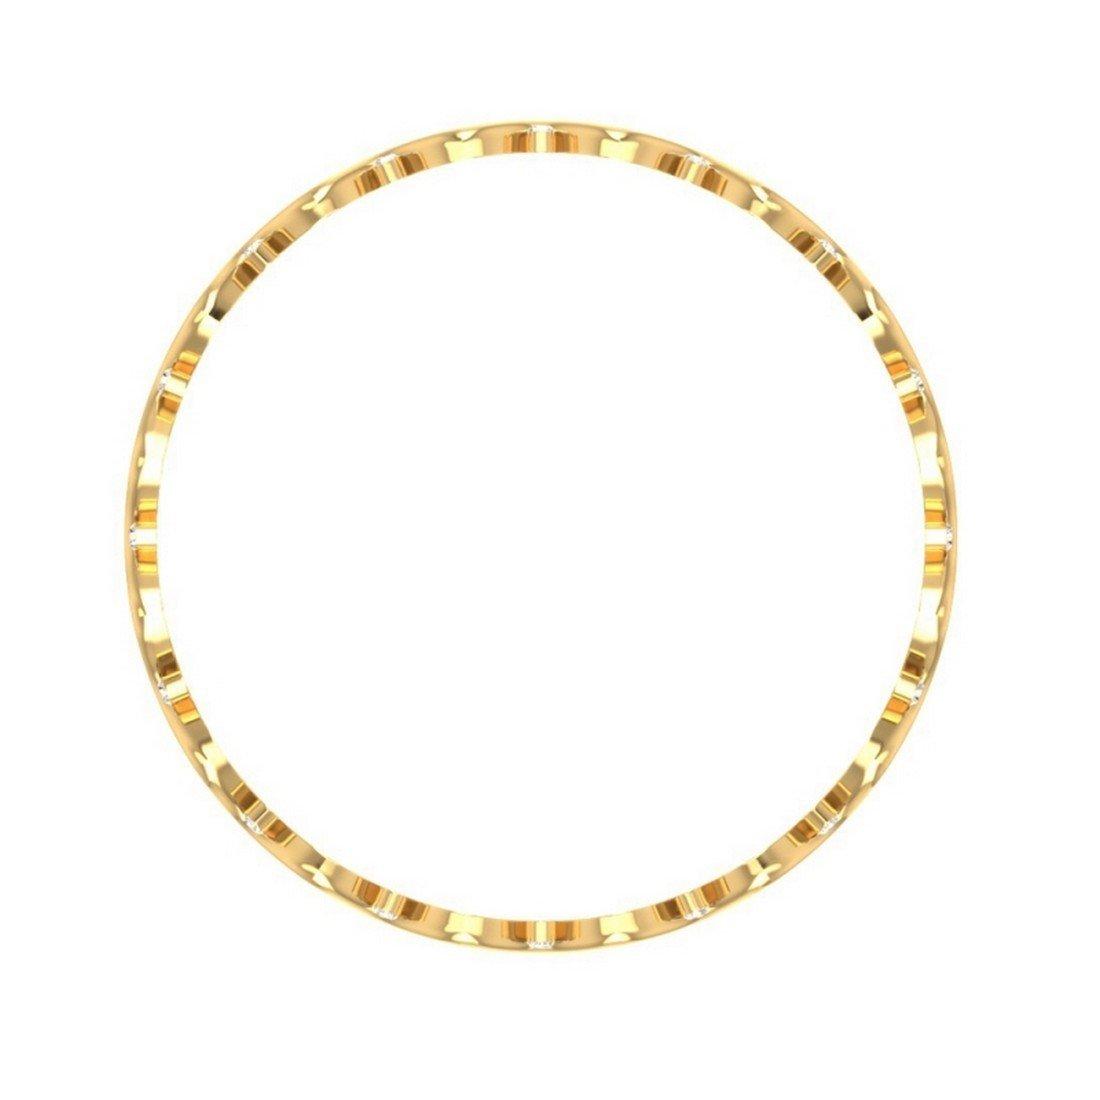 14K Yellow Gold bangle-bracelets Size HallMarked IJ| SI 9.75 inches 1.25 cttw Round-Cut-Diamond